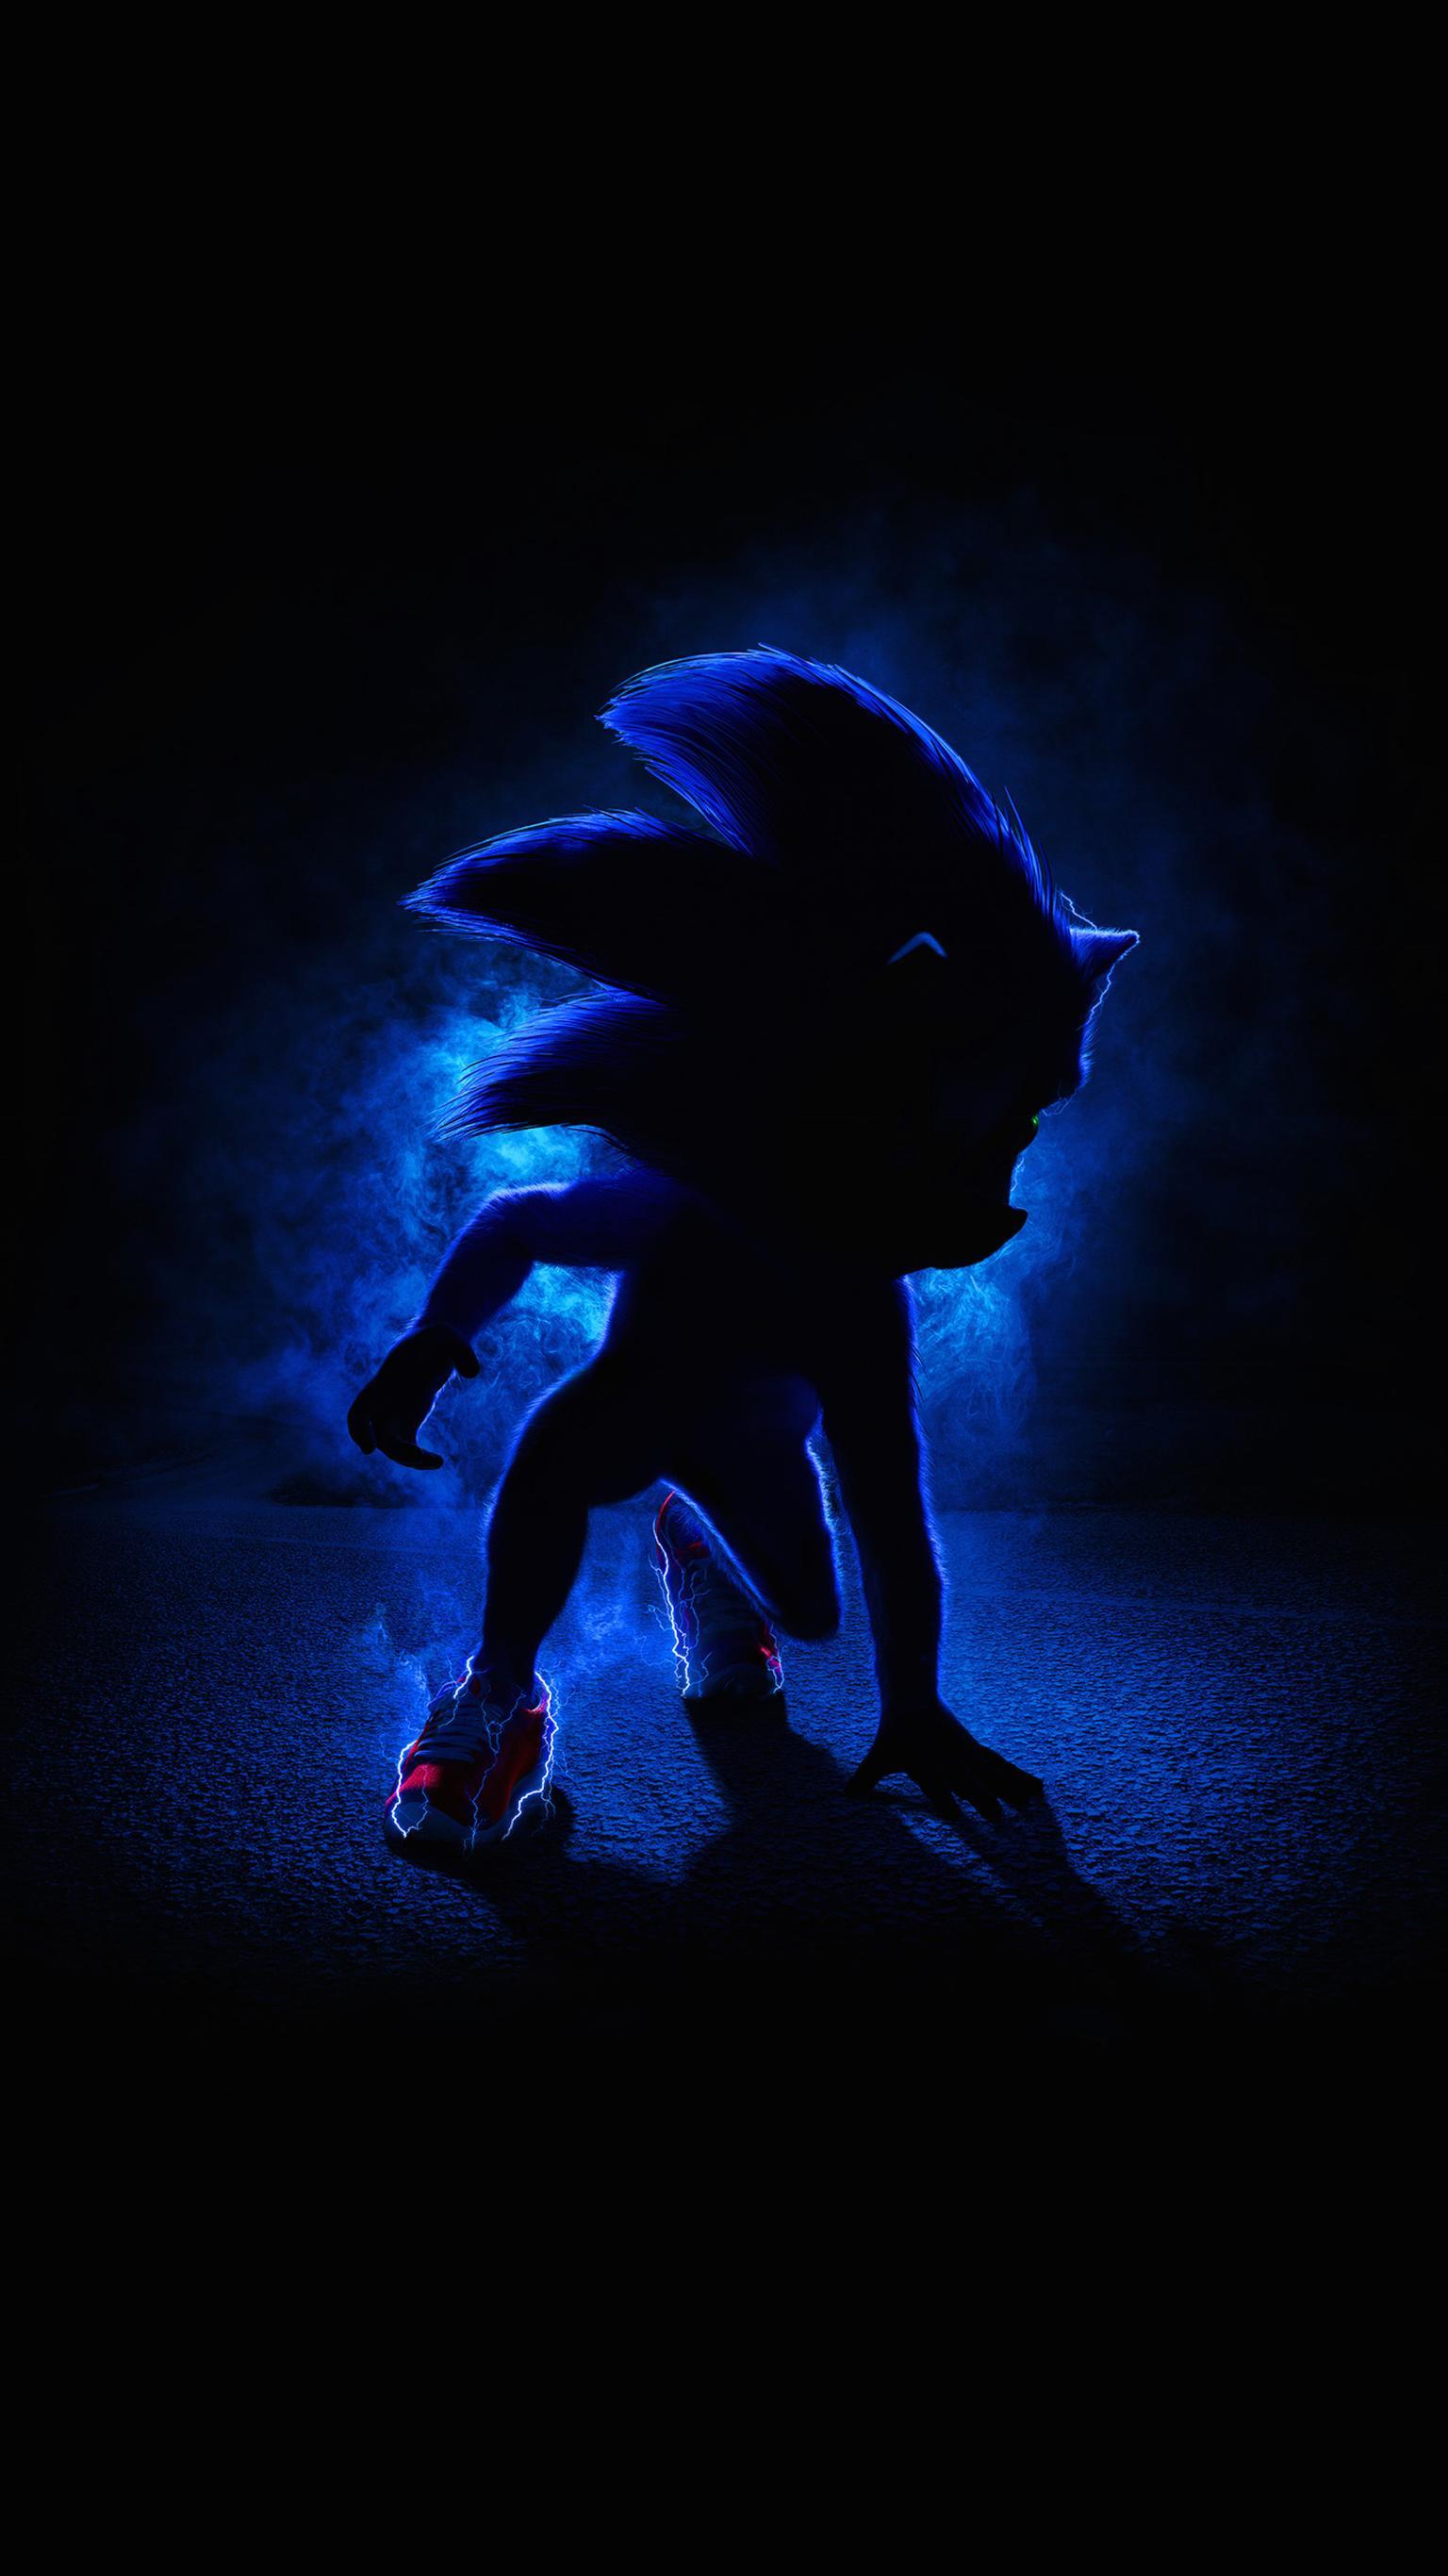 Sonic the Hedgehog 2020 Phone Wallpaper Moviemania 1536x2732